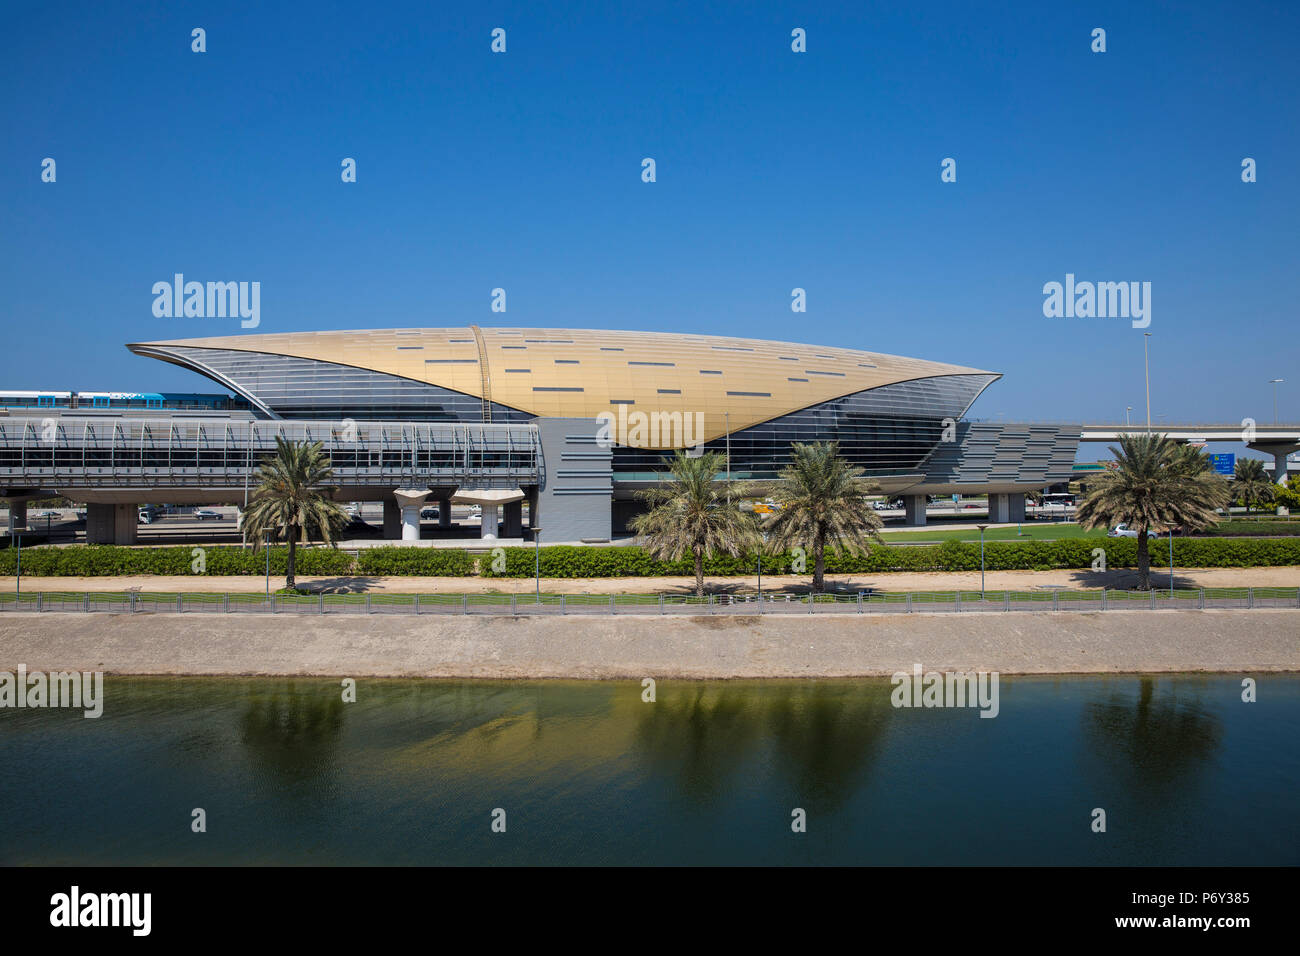 Vereinigte Arabische Emirate, Dubai, Mall of the Emirates U-Bahn Station Stockbild